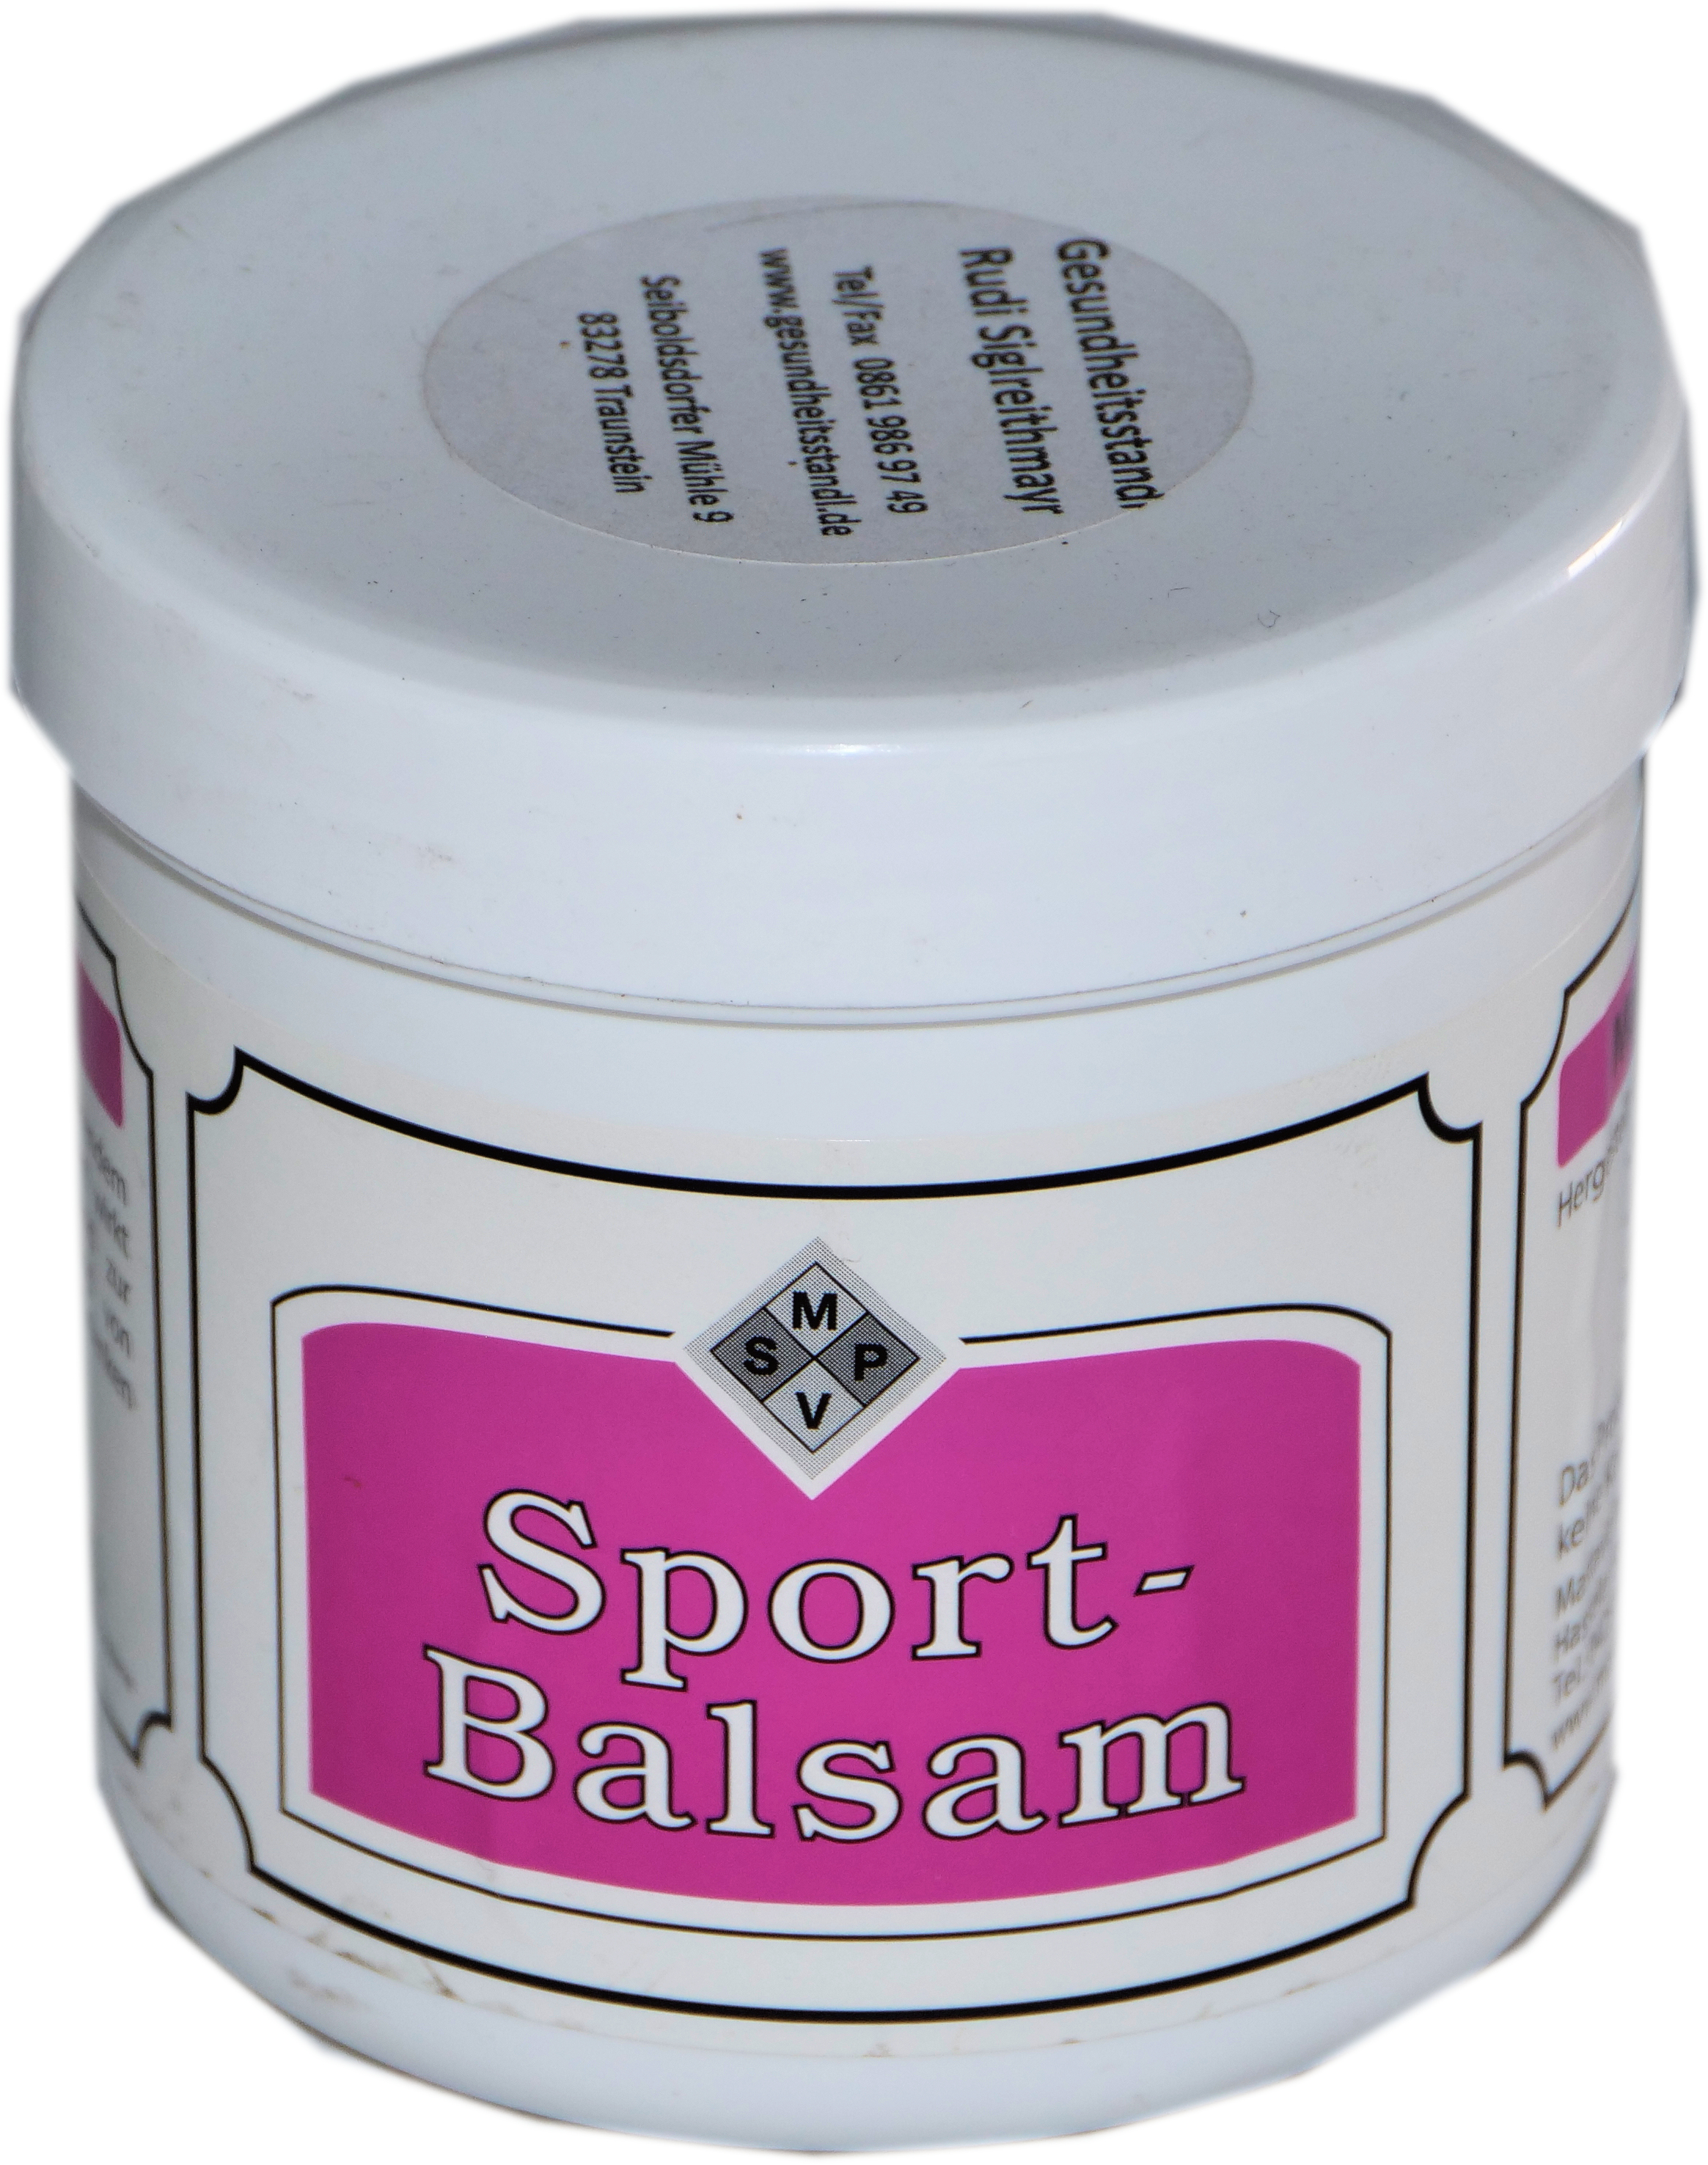 Sportbalsam